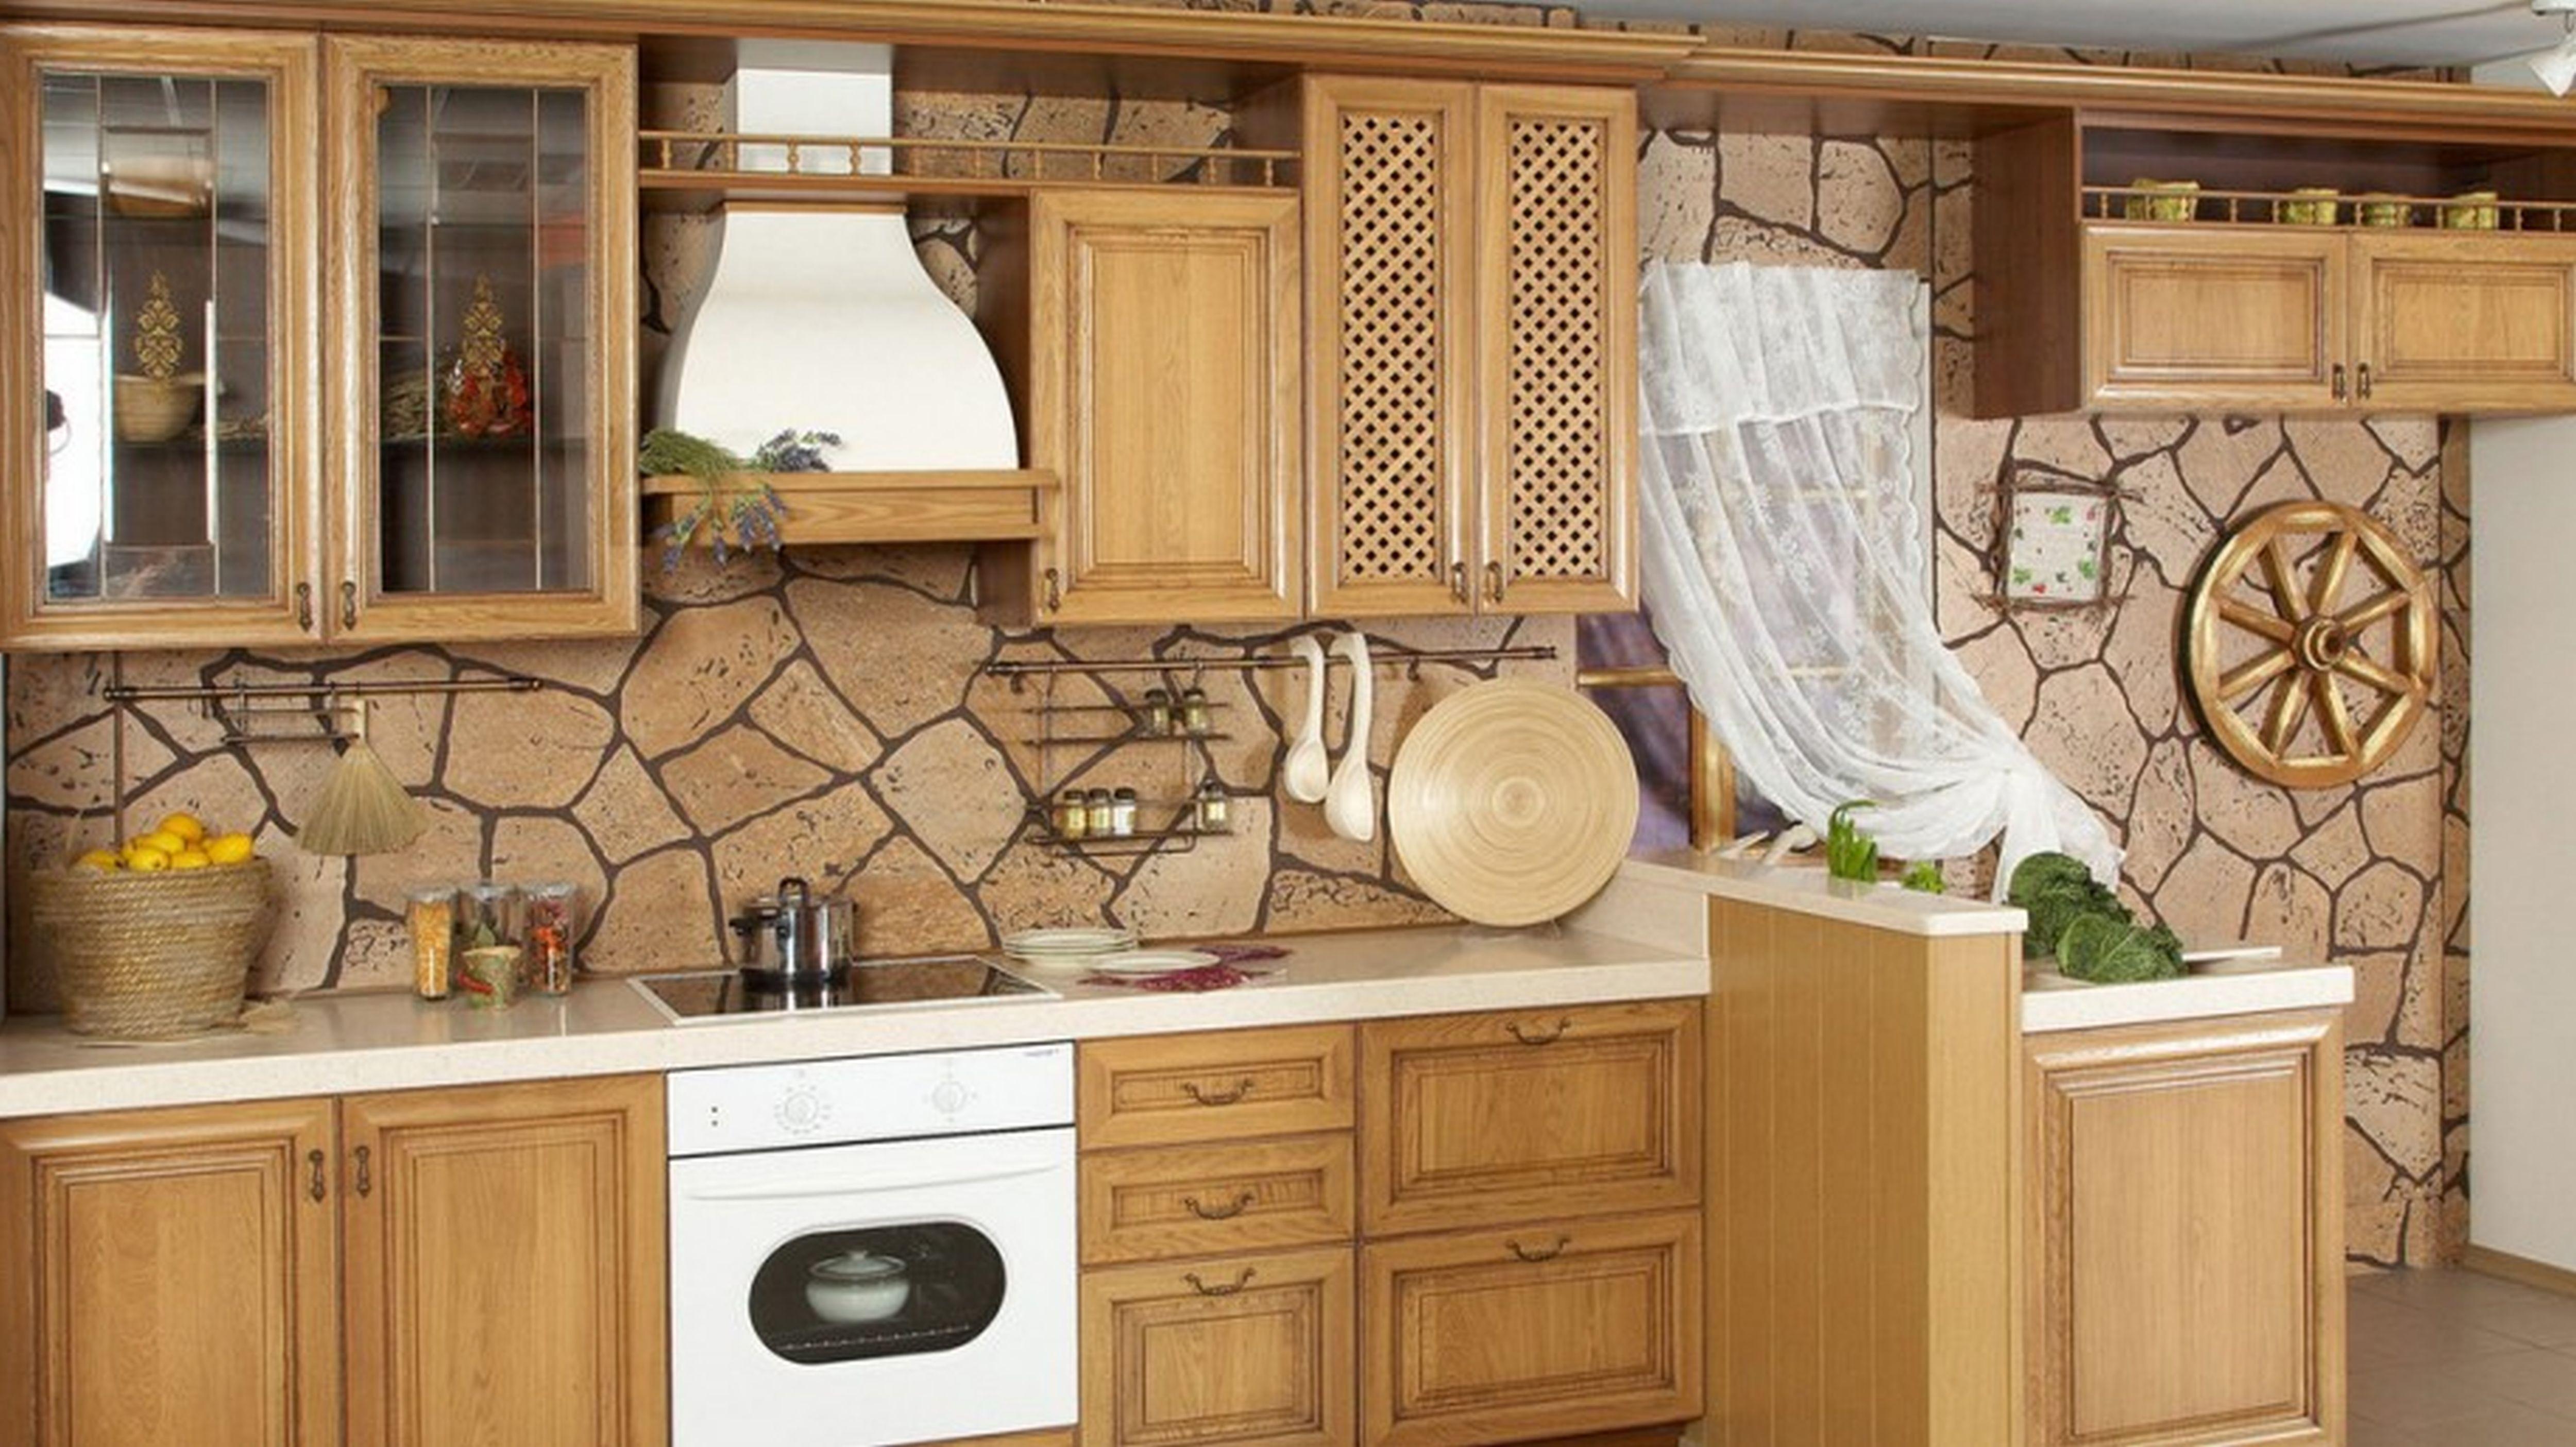 Ready made kitchen islands photo - 2